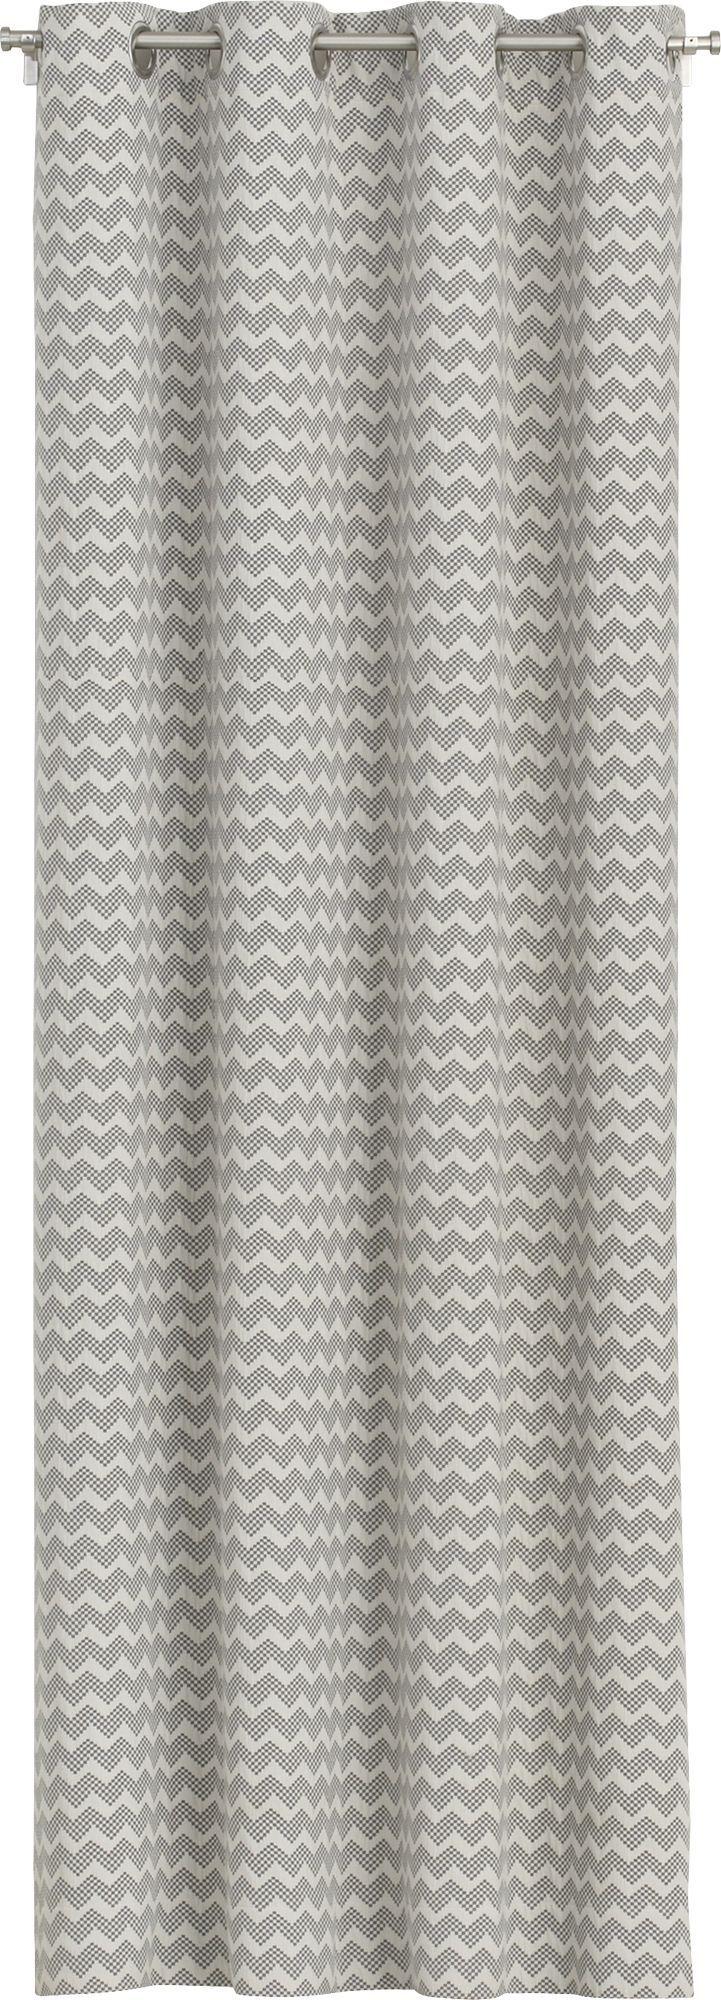 Gray chevron curtain panels - Reilly Grey Chevron Curtains